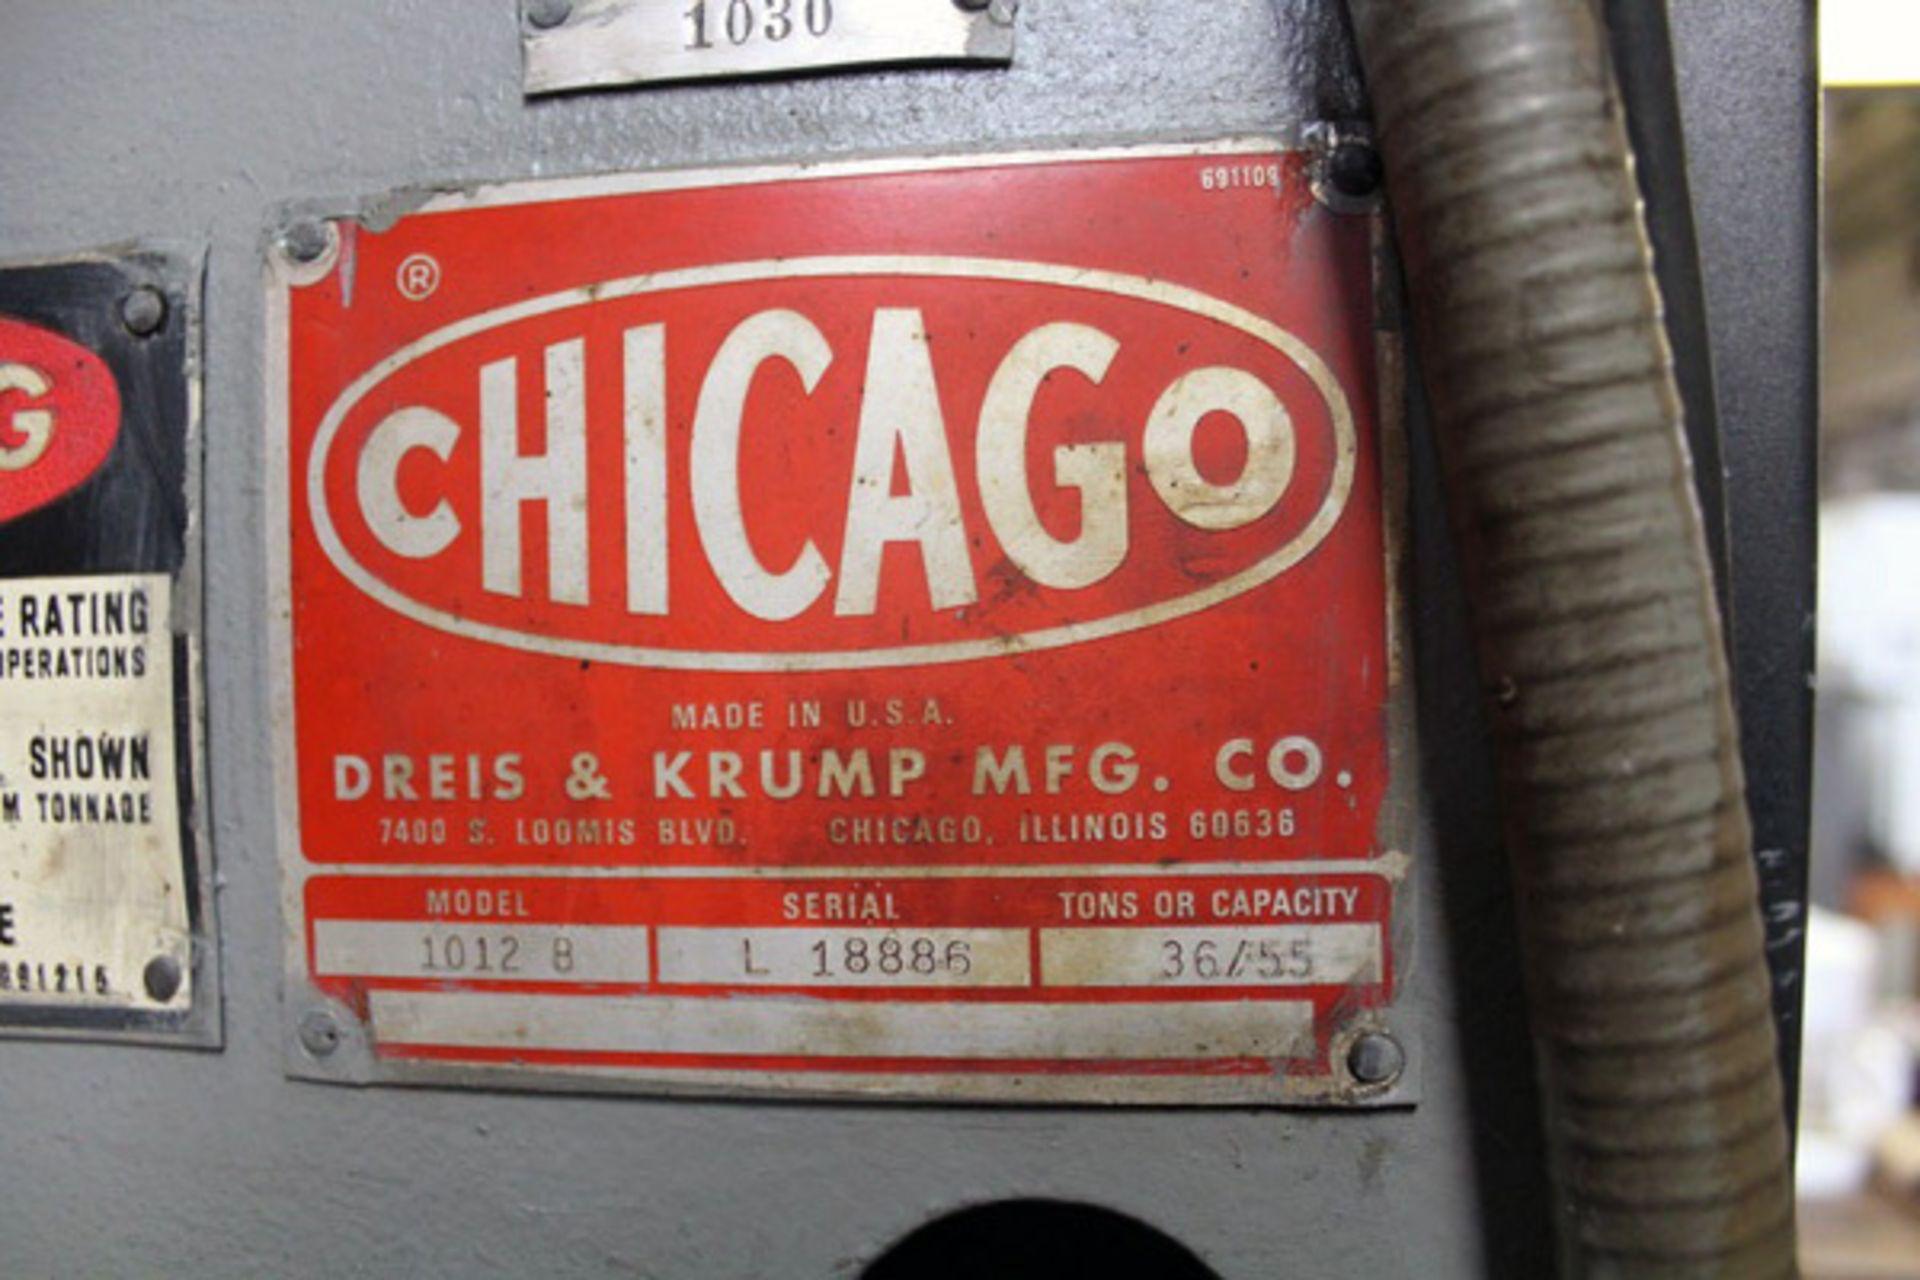 Lot 40 - Chicago CNC Air Clutch Press Brake | 55-Ton x 12', Mdl: 1012B, S/N: L-18886 - 8648P